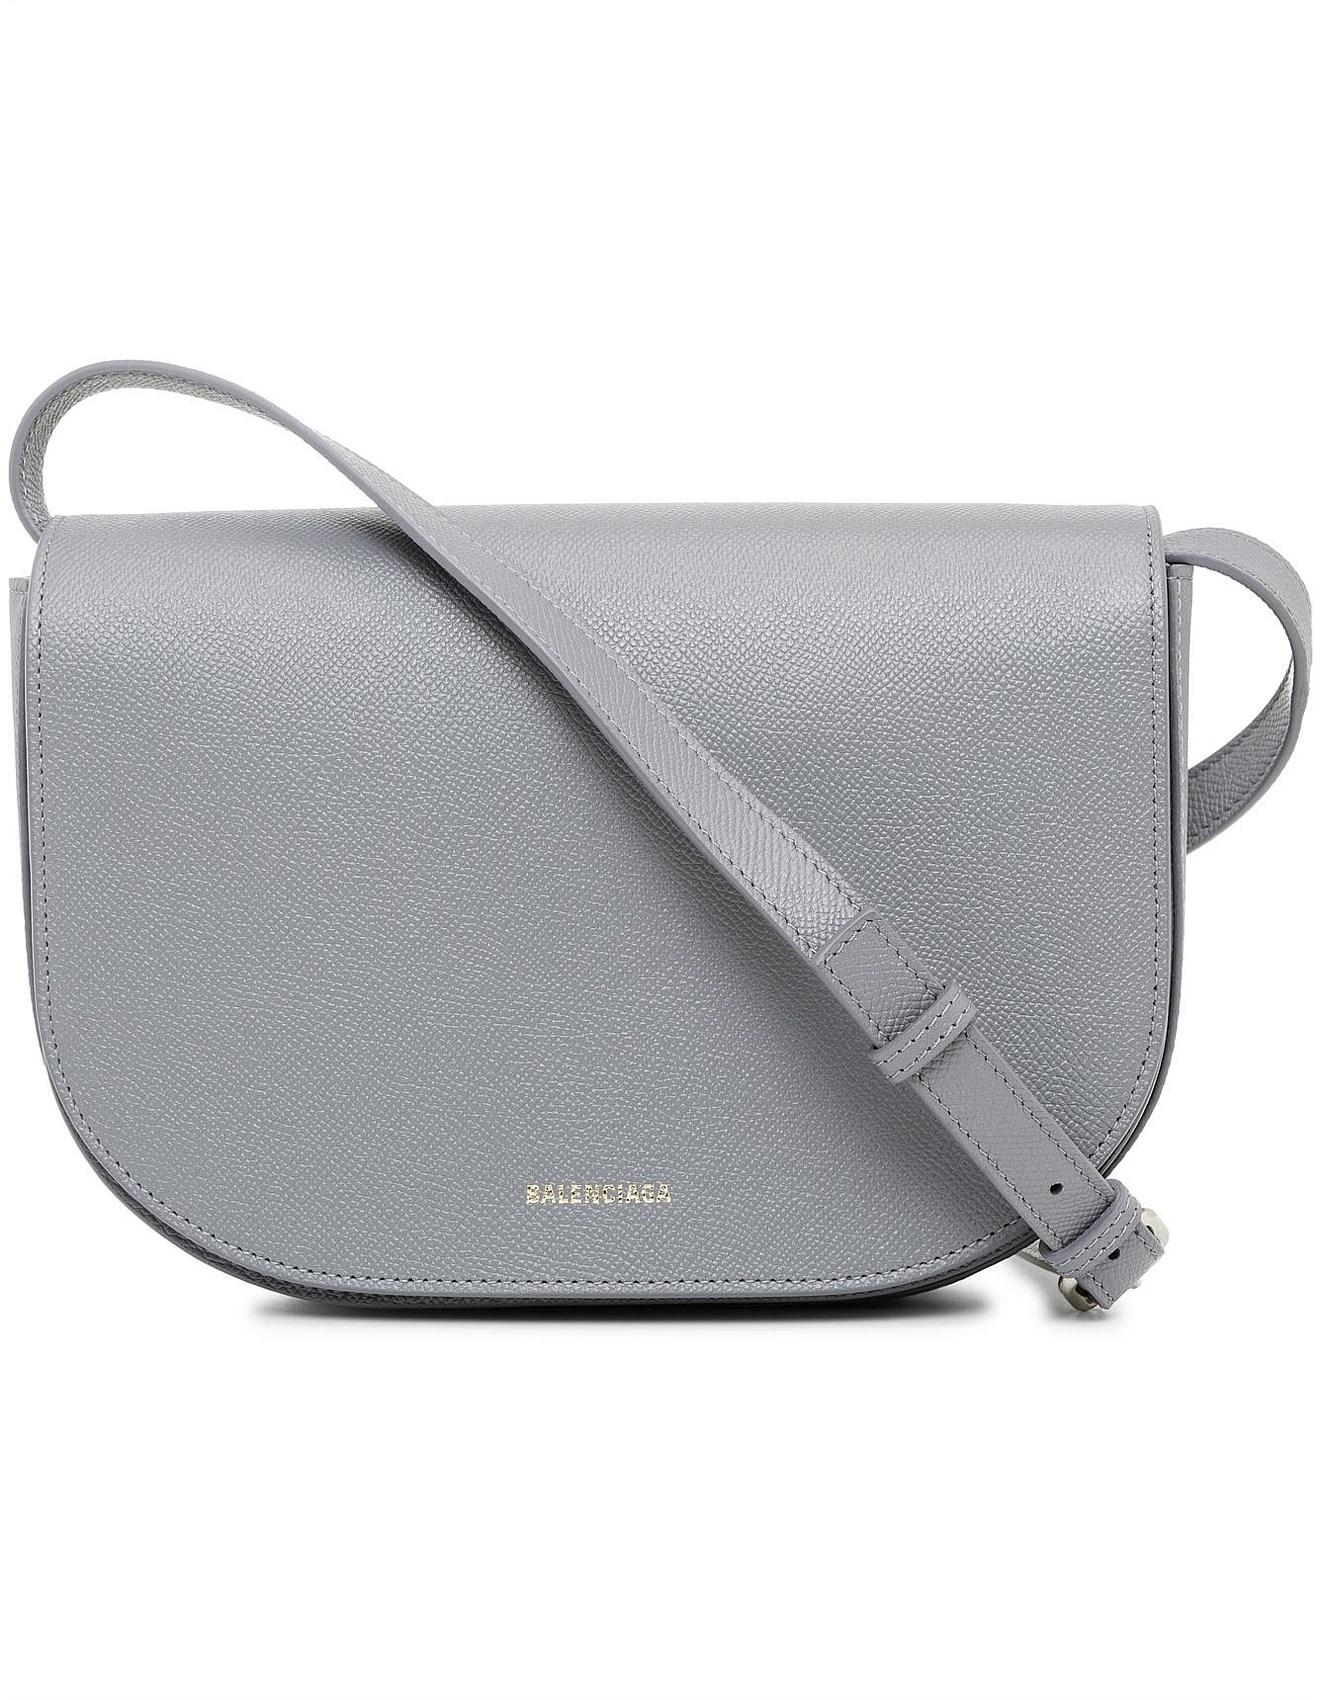 4b9fbc0ec3c Cross Body Bags   Women s Designer Bags Australia   David Jones - VILLE  SMALL SADDLE AJ DAY BAG